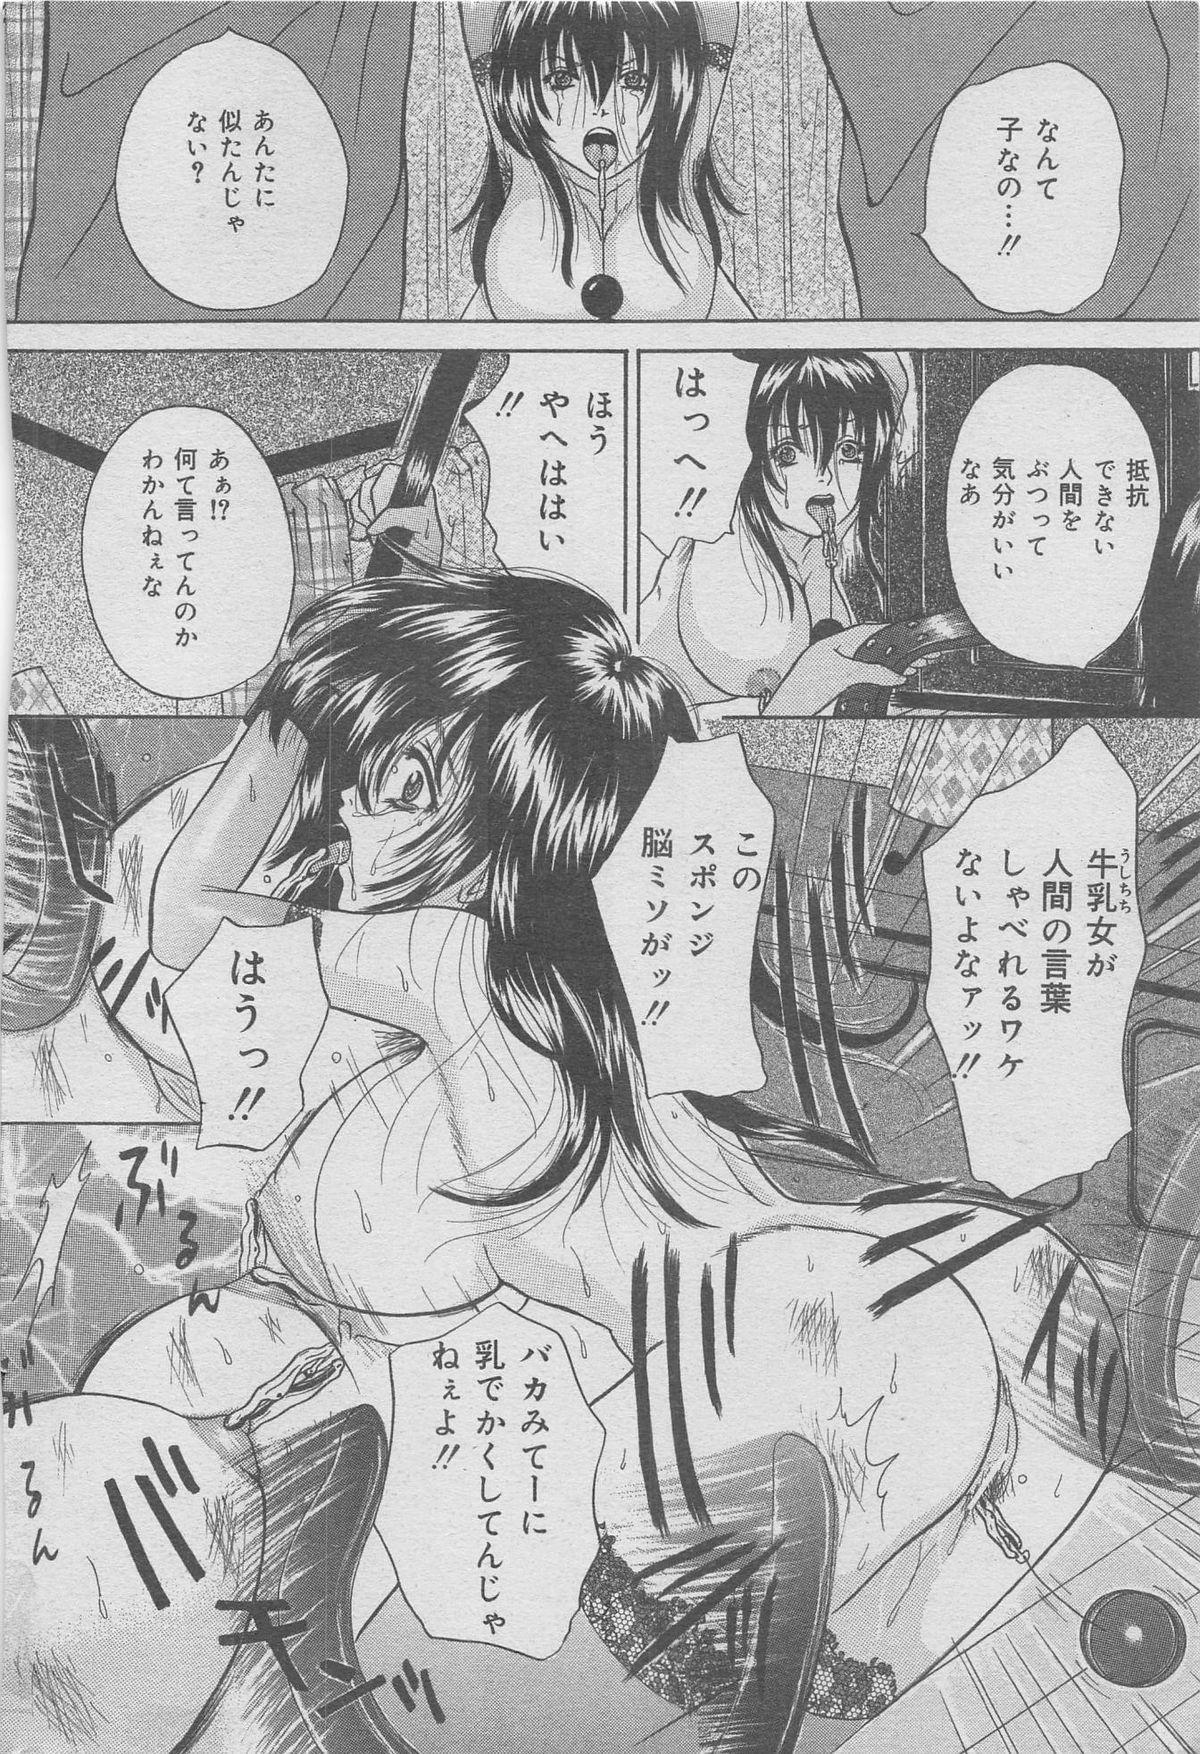 Hontou ni Atta Kindanai vol.7 29